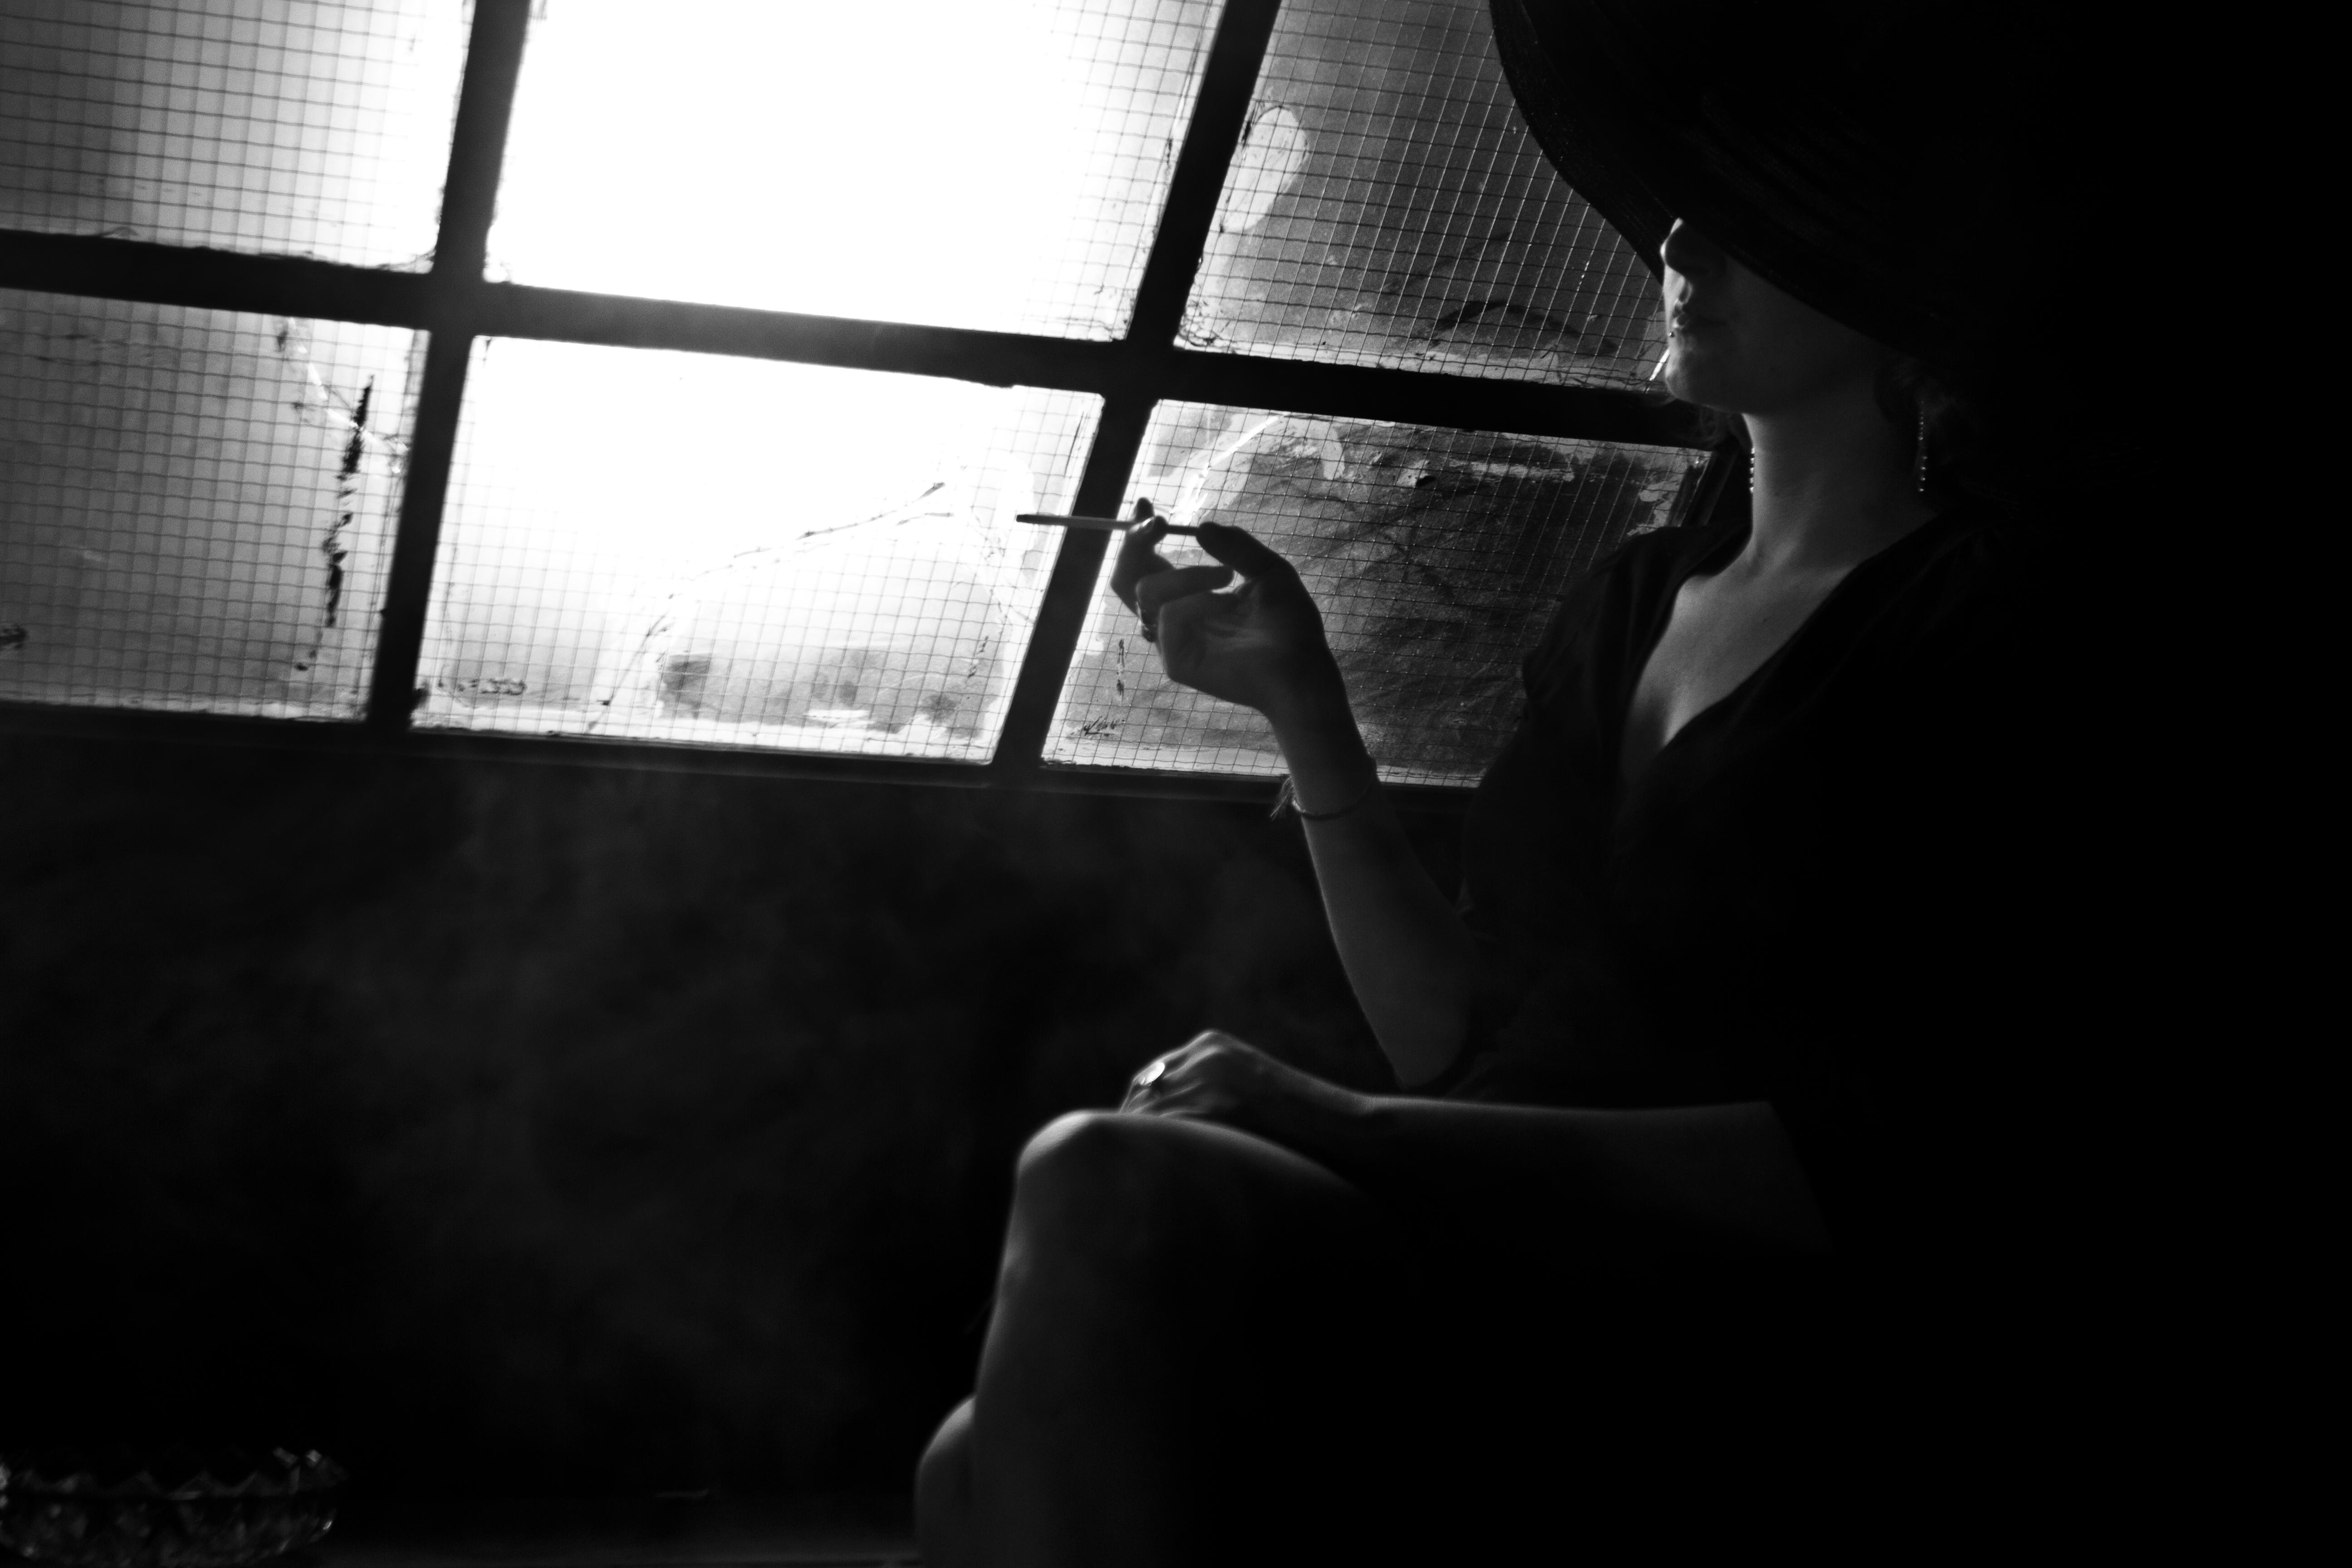 Film Noir Film noir 5184x3456